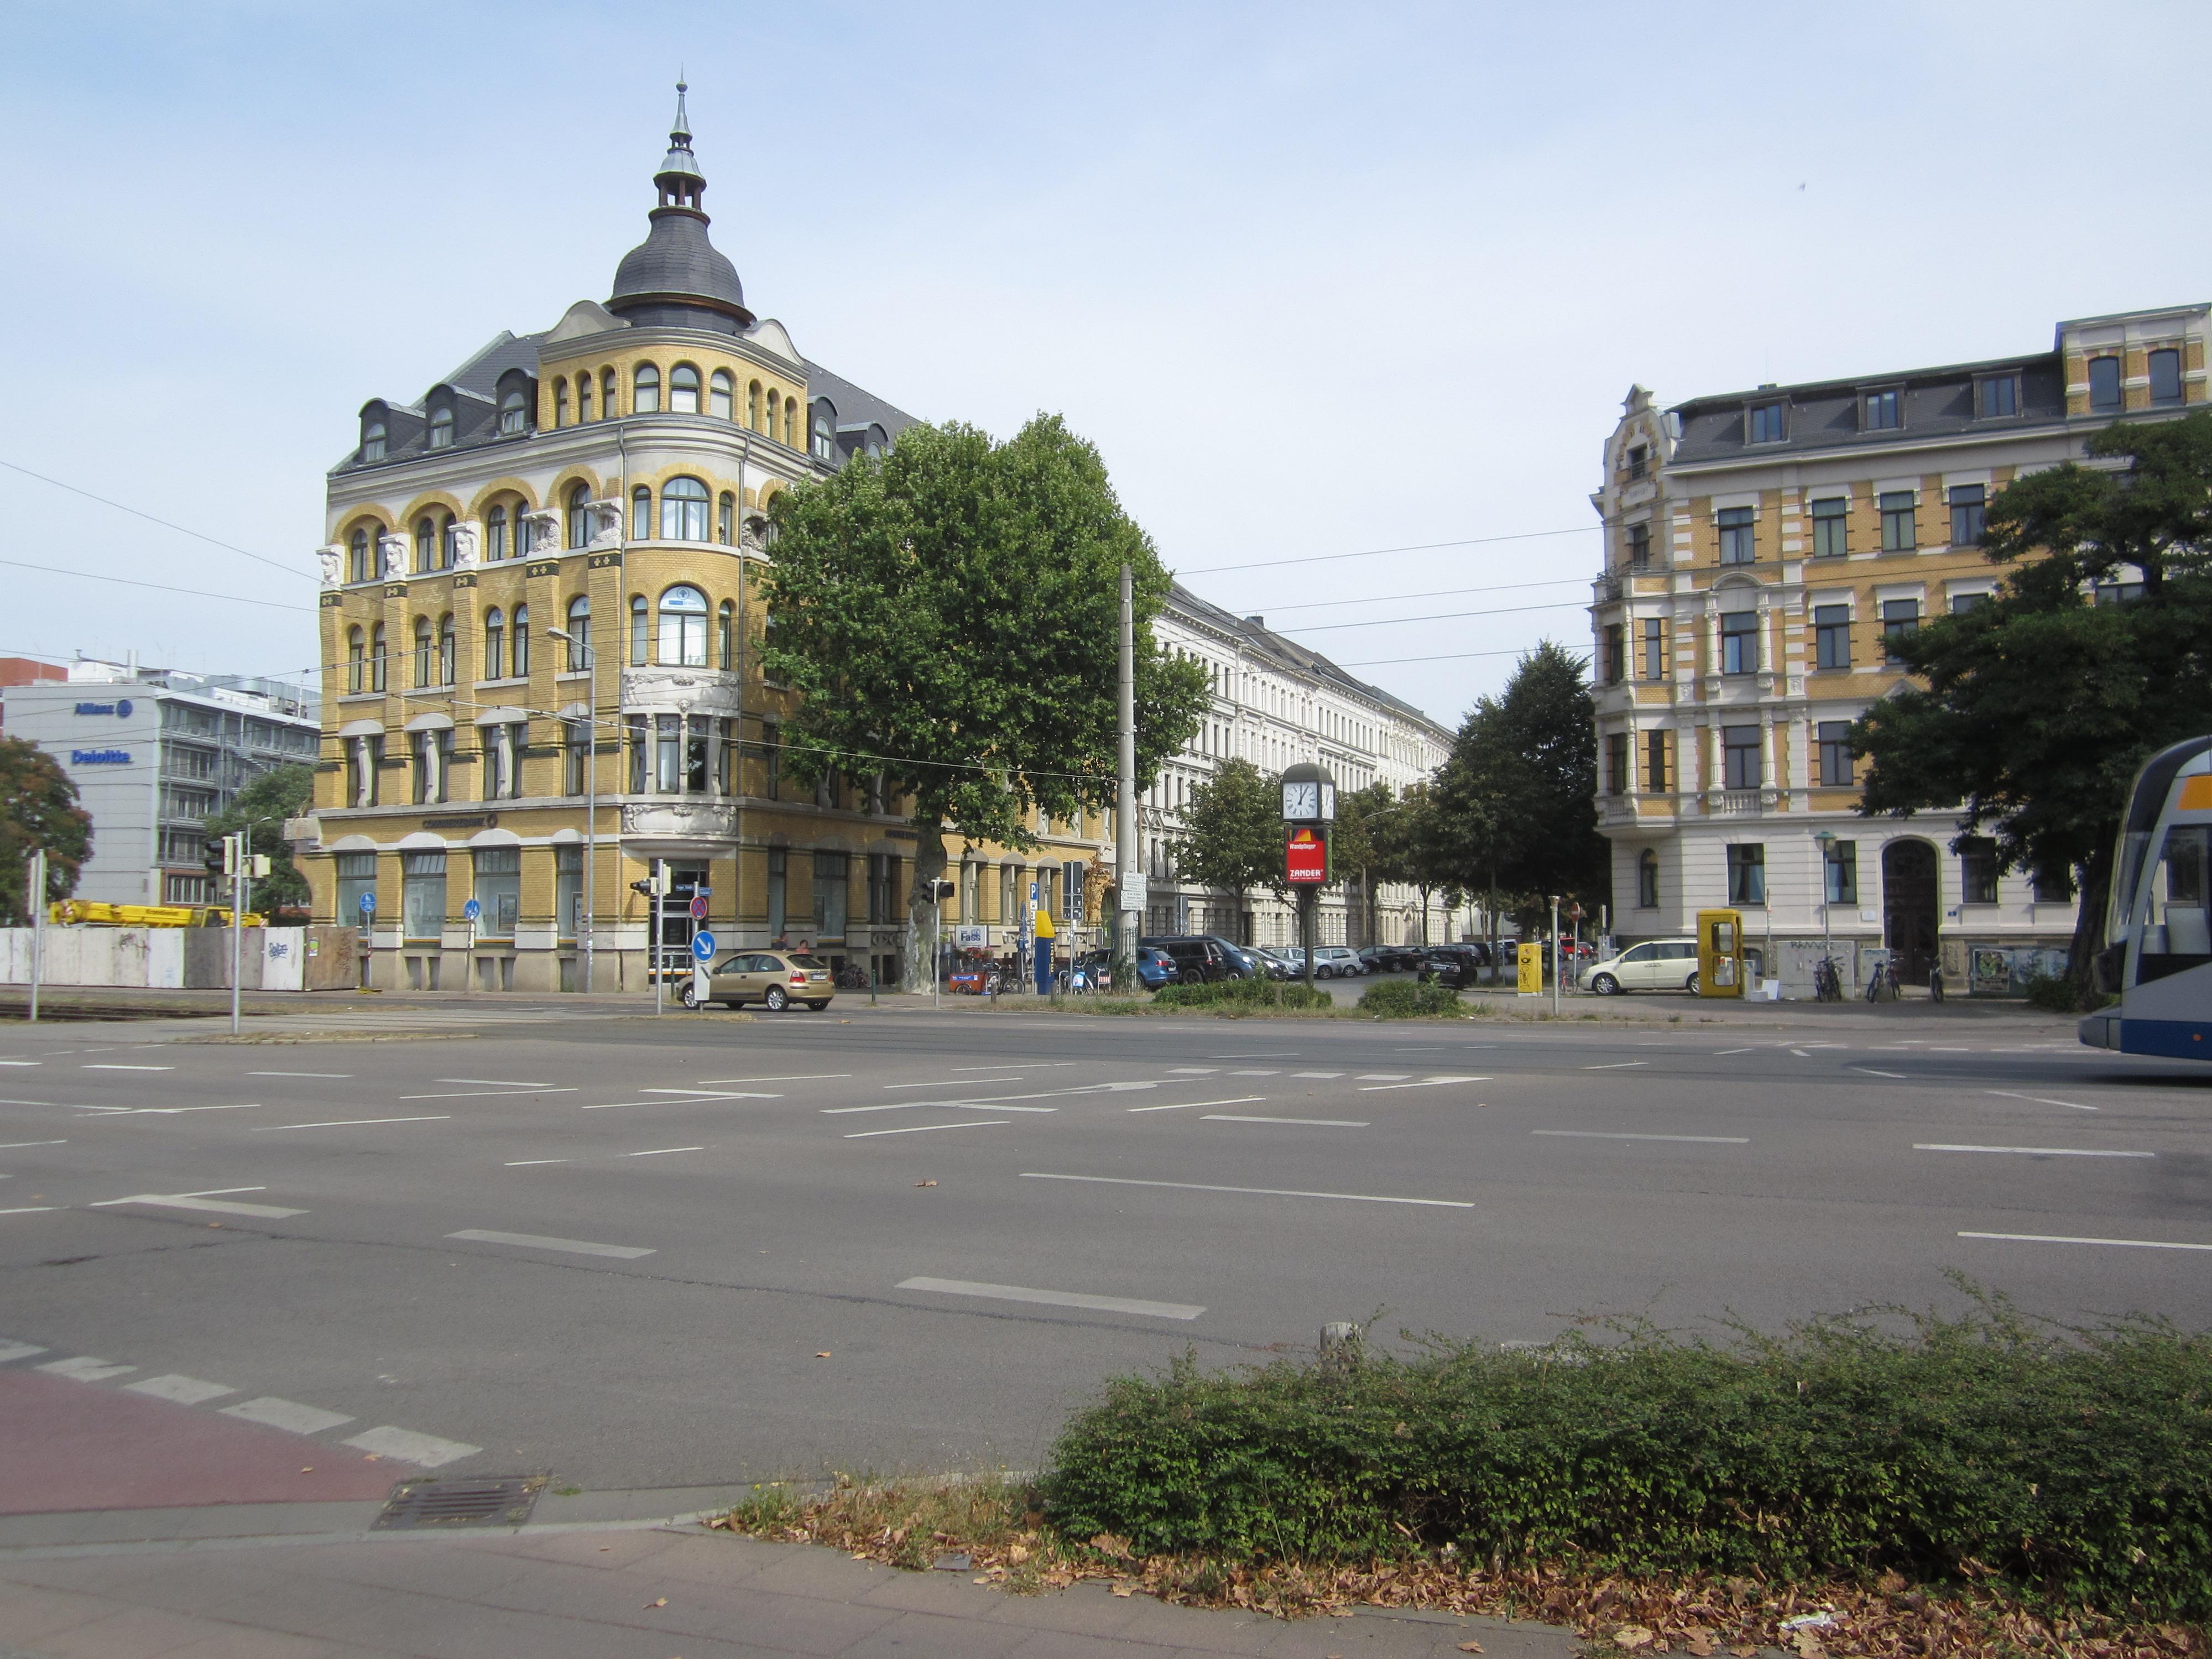 Ostplatz Leipzig file ostplatz leipzig 2016 003 jpg wikimedia commons